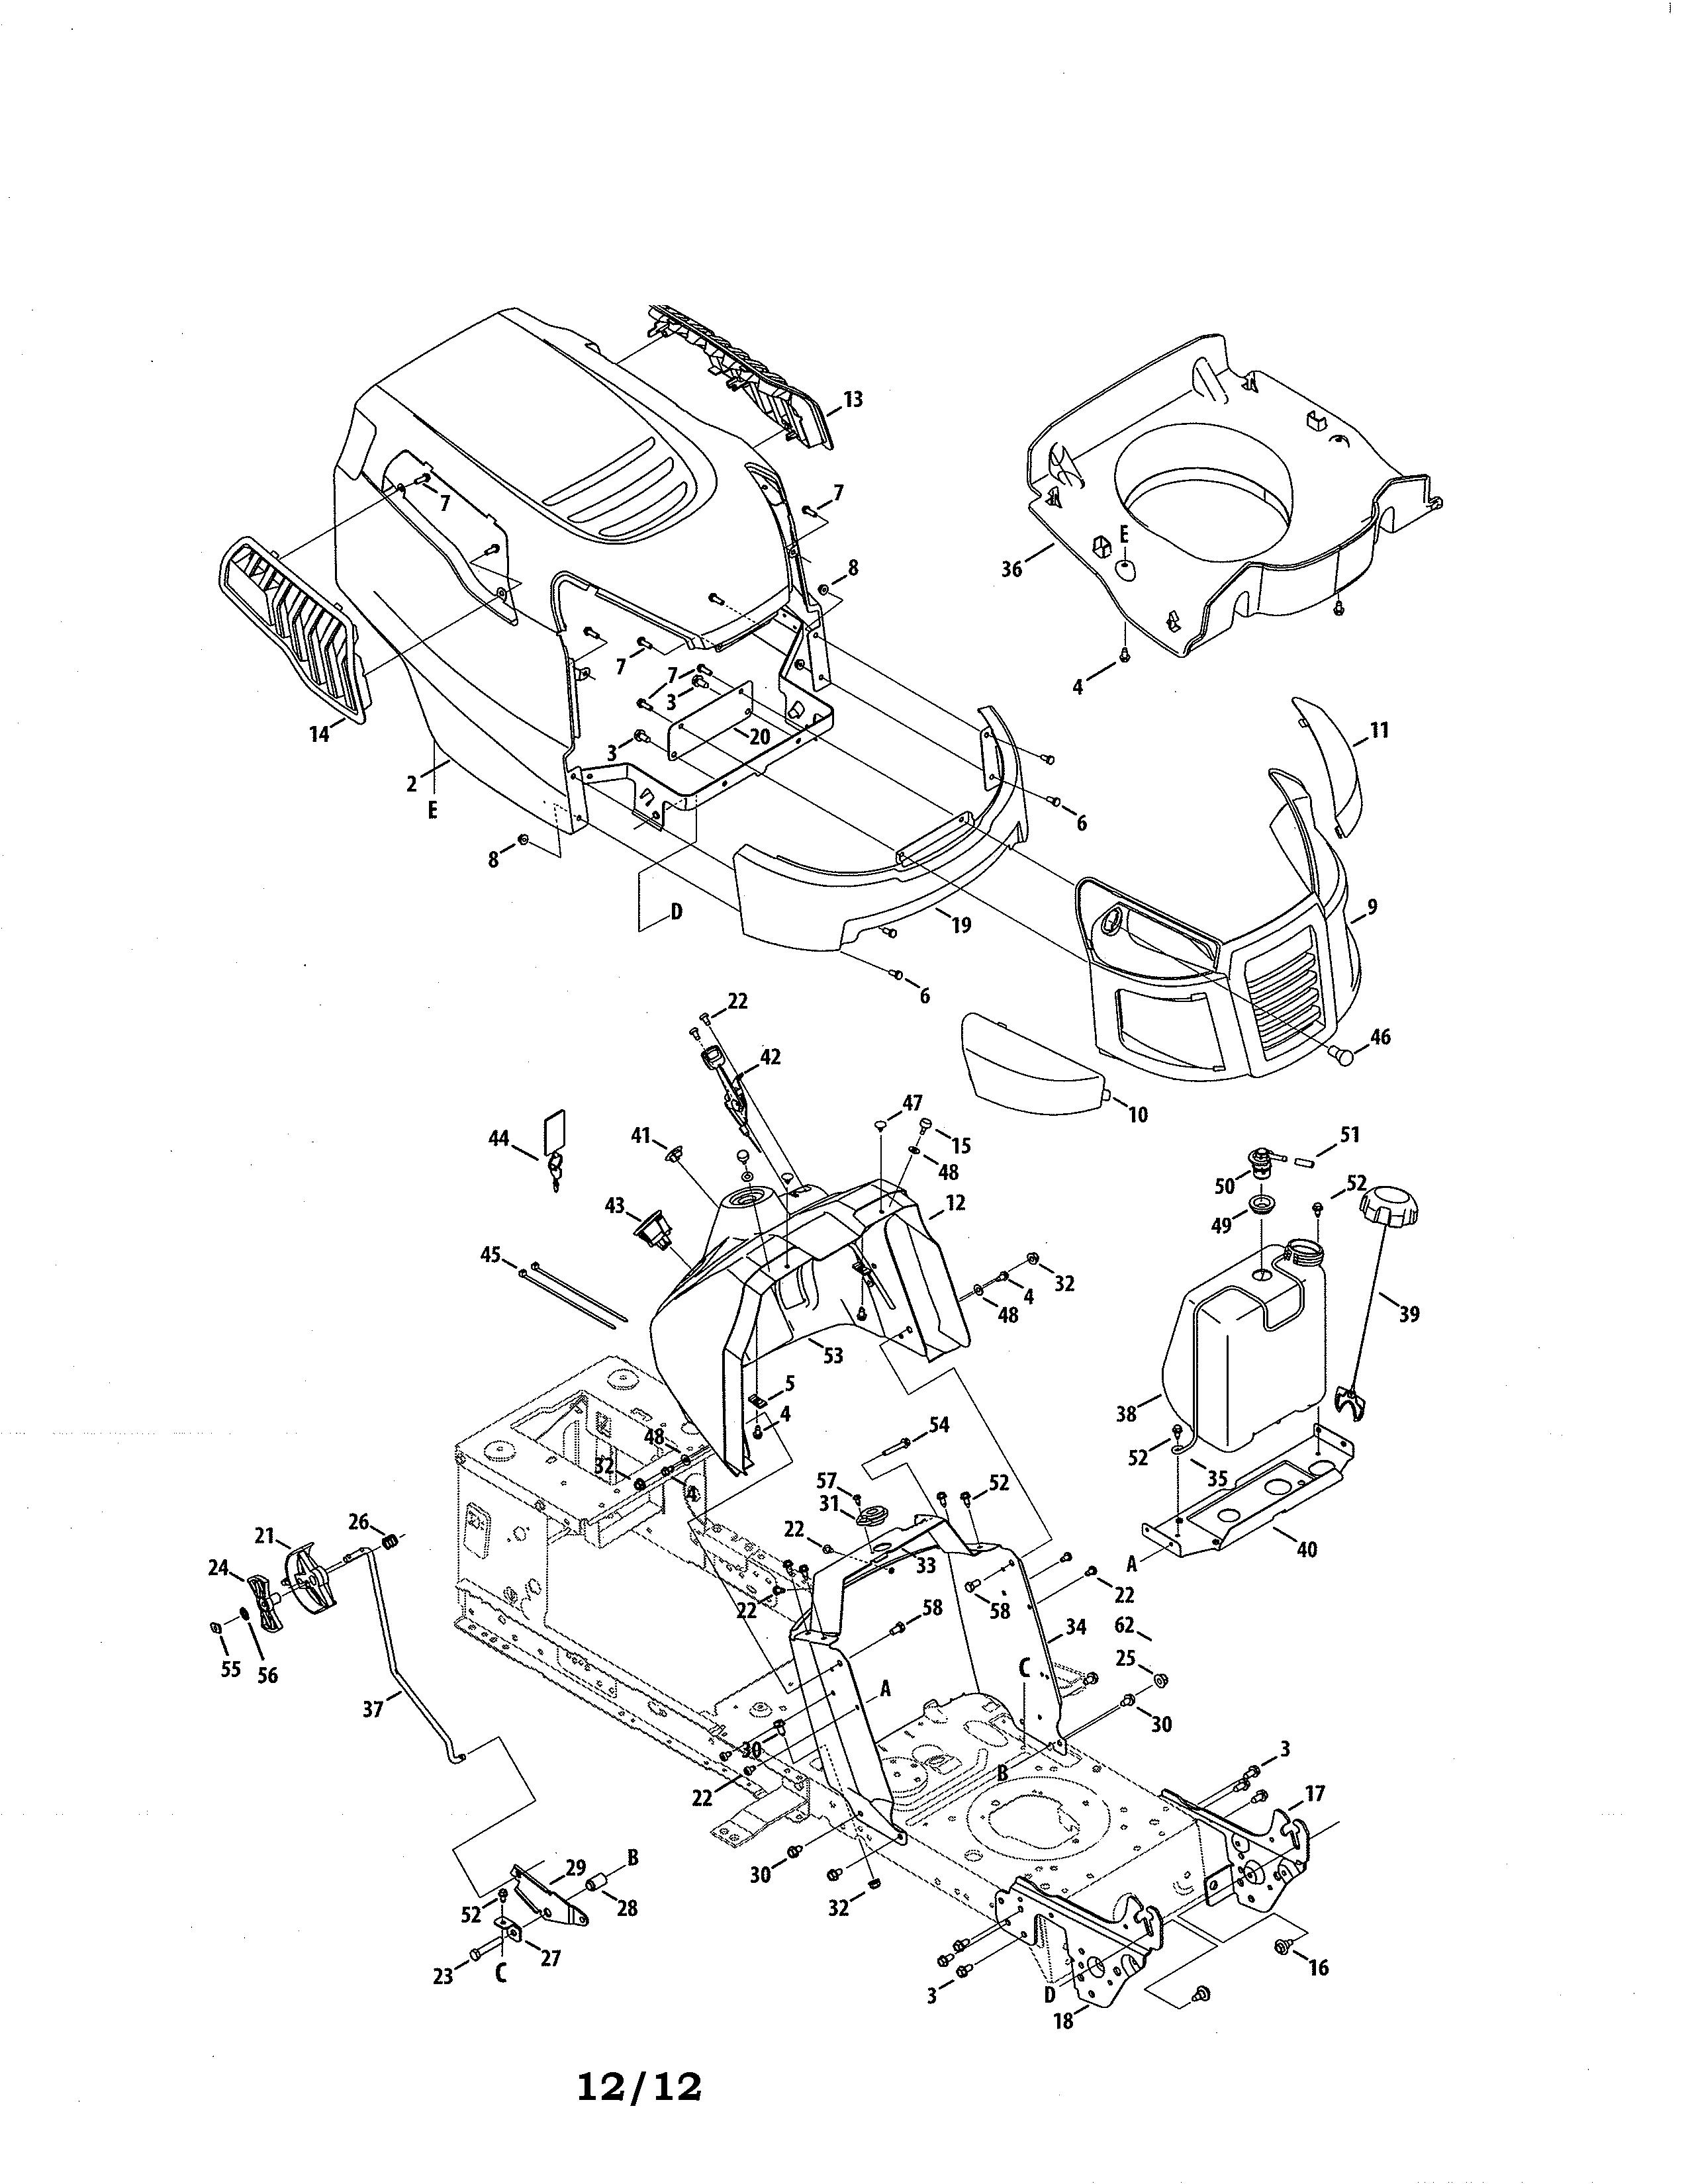 Craftsman model 247288820 lawn tractor genuine parts predator 420cc engine wiring diagram 420cc engine diagram